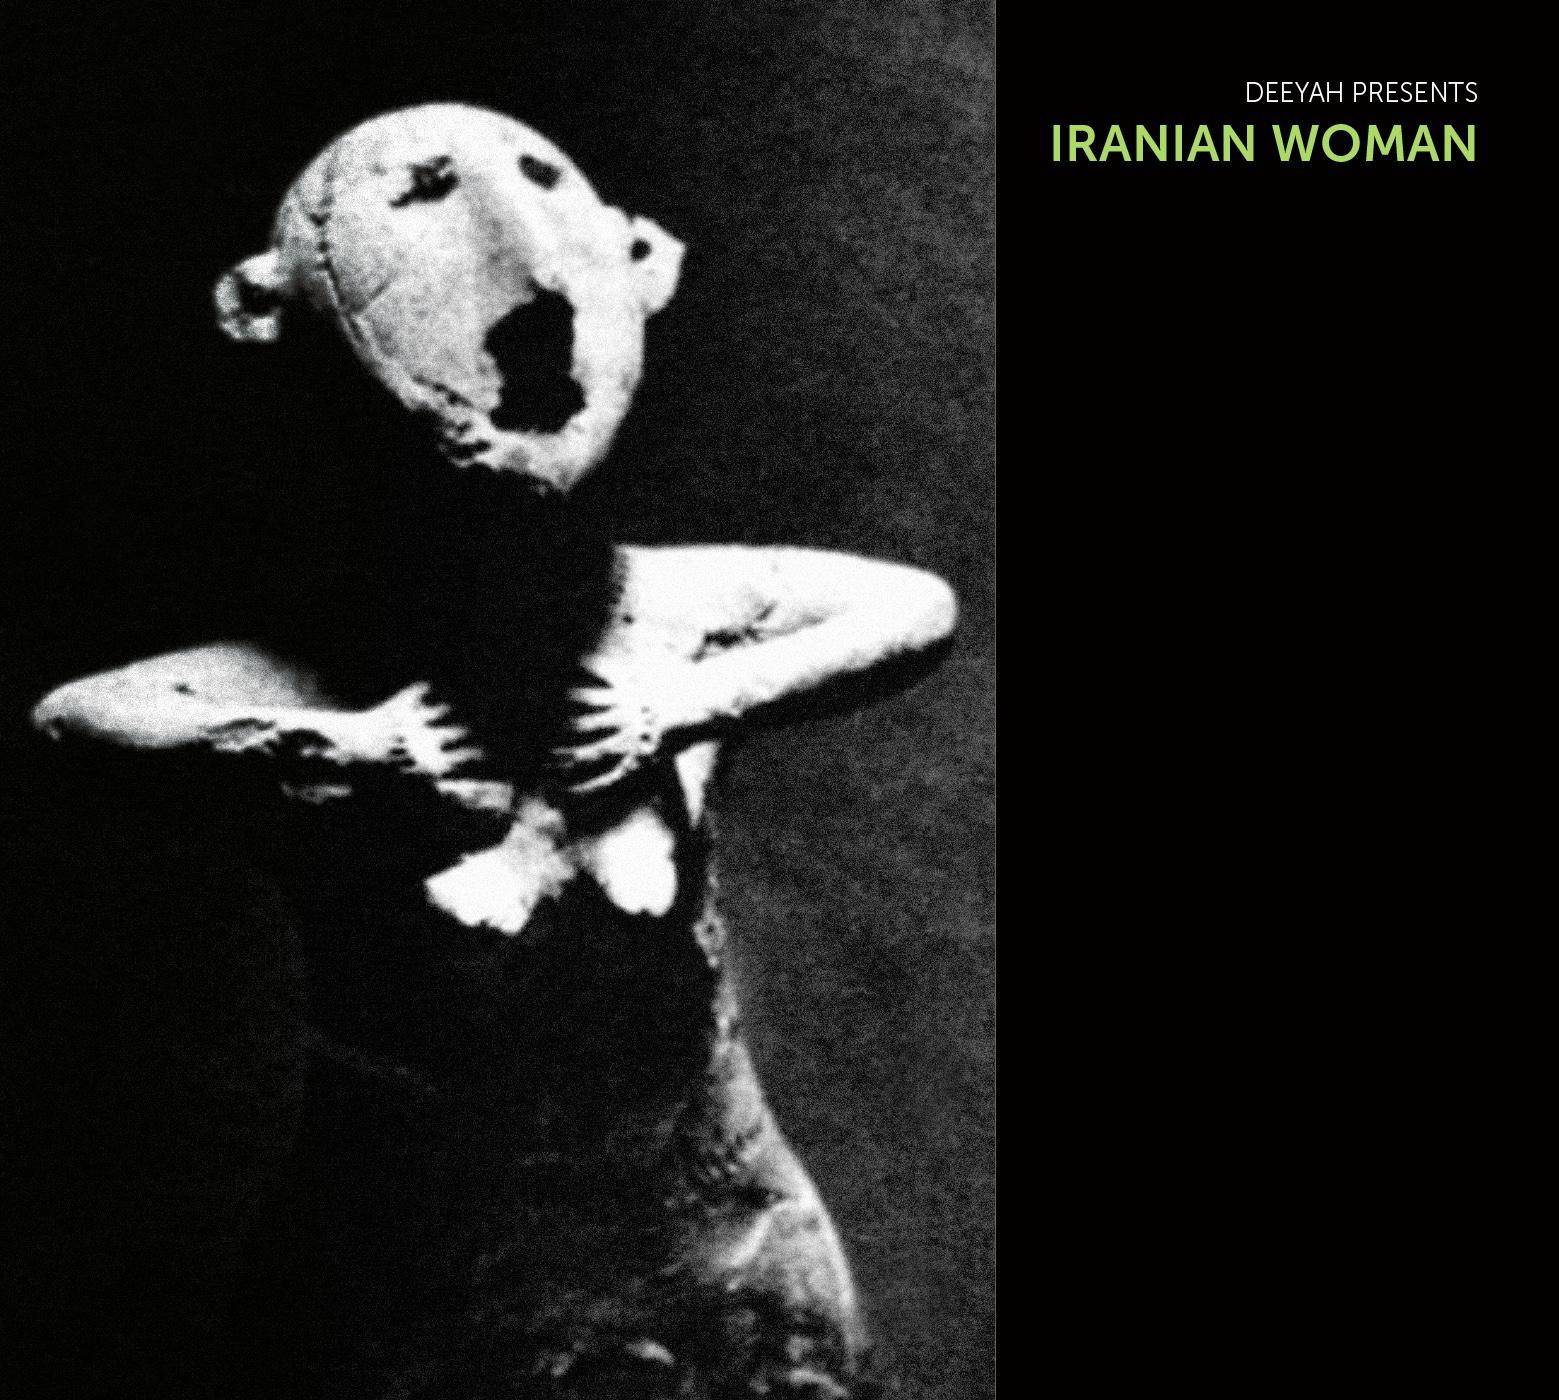 Deeyah Presents IRANIAN WOMAN